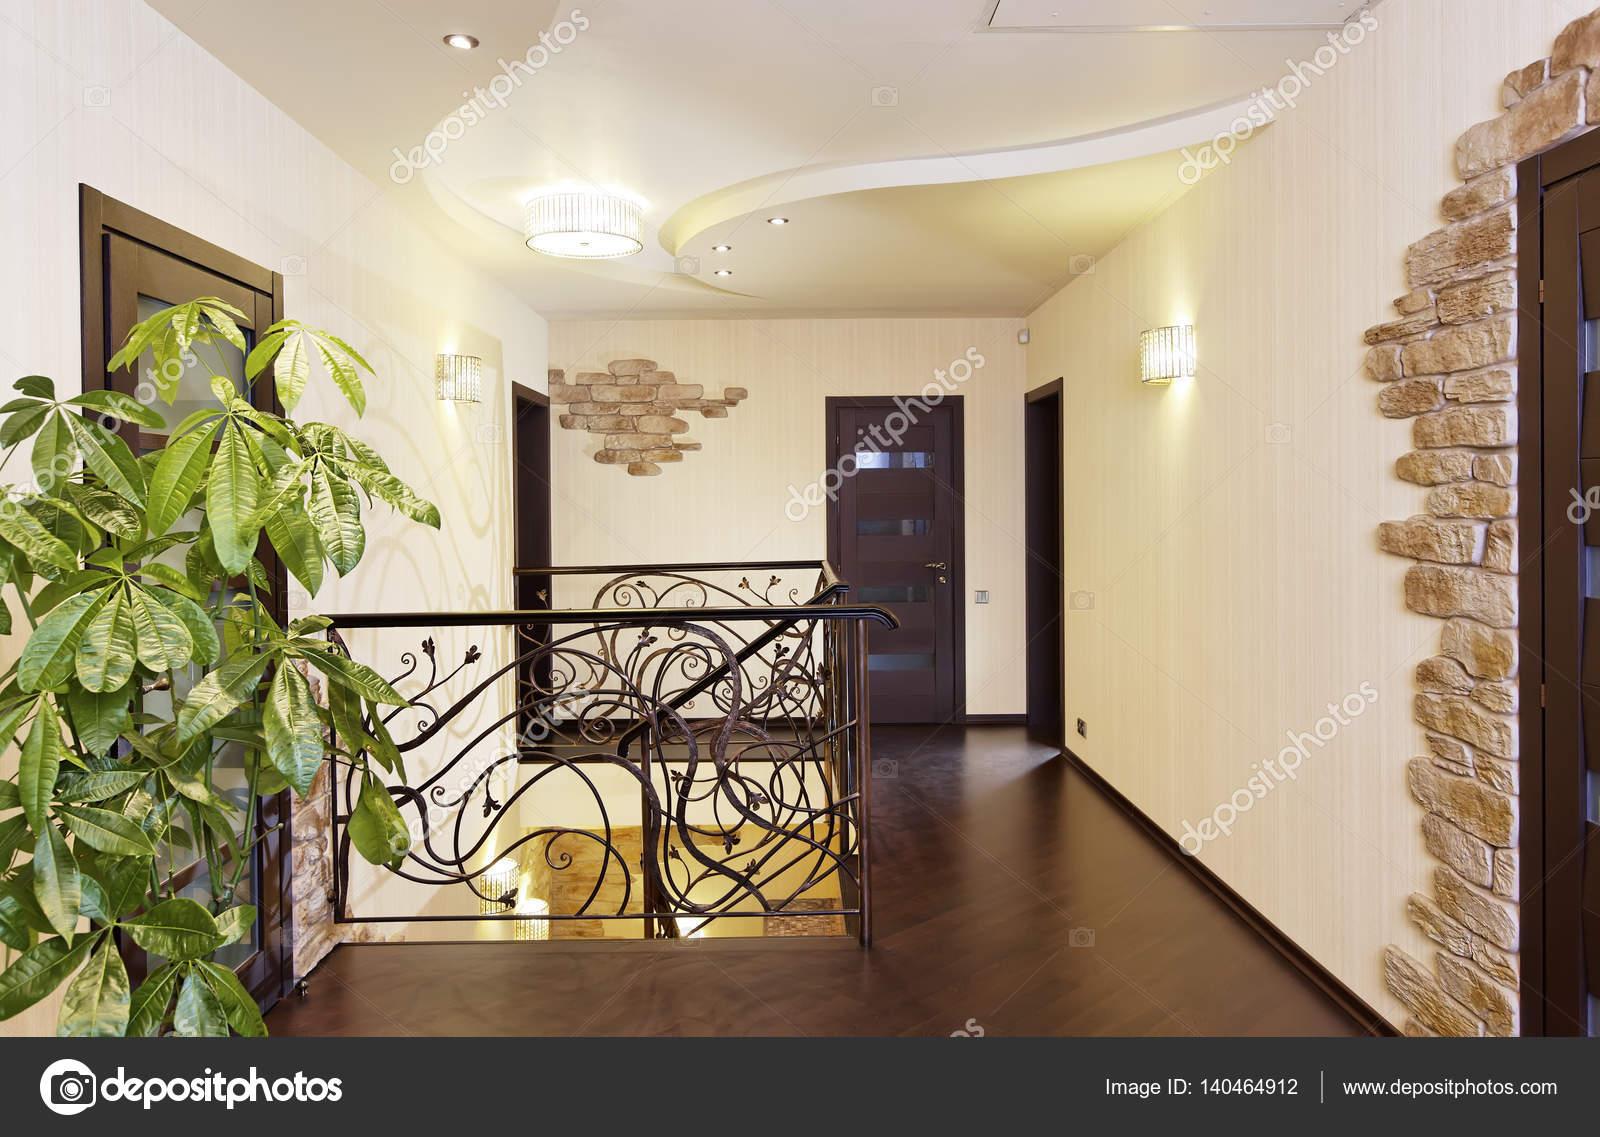 Klassische Treppen klassische treppen mit ornamentalen handlauf im flur mit türen